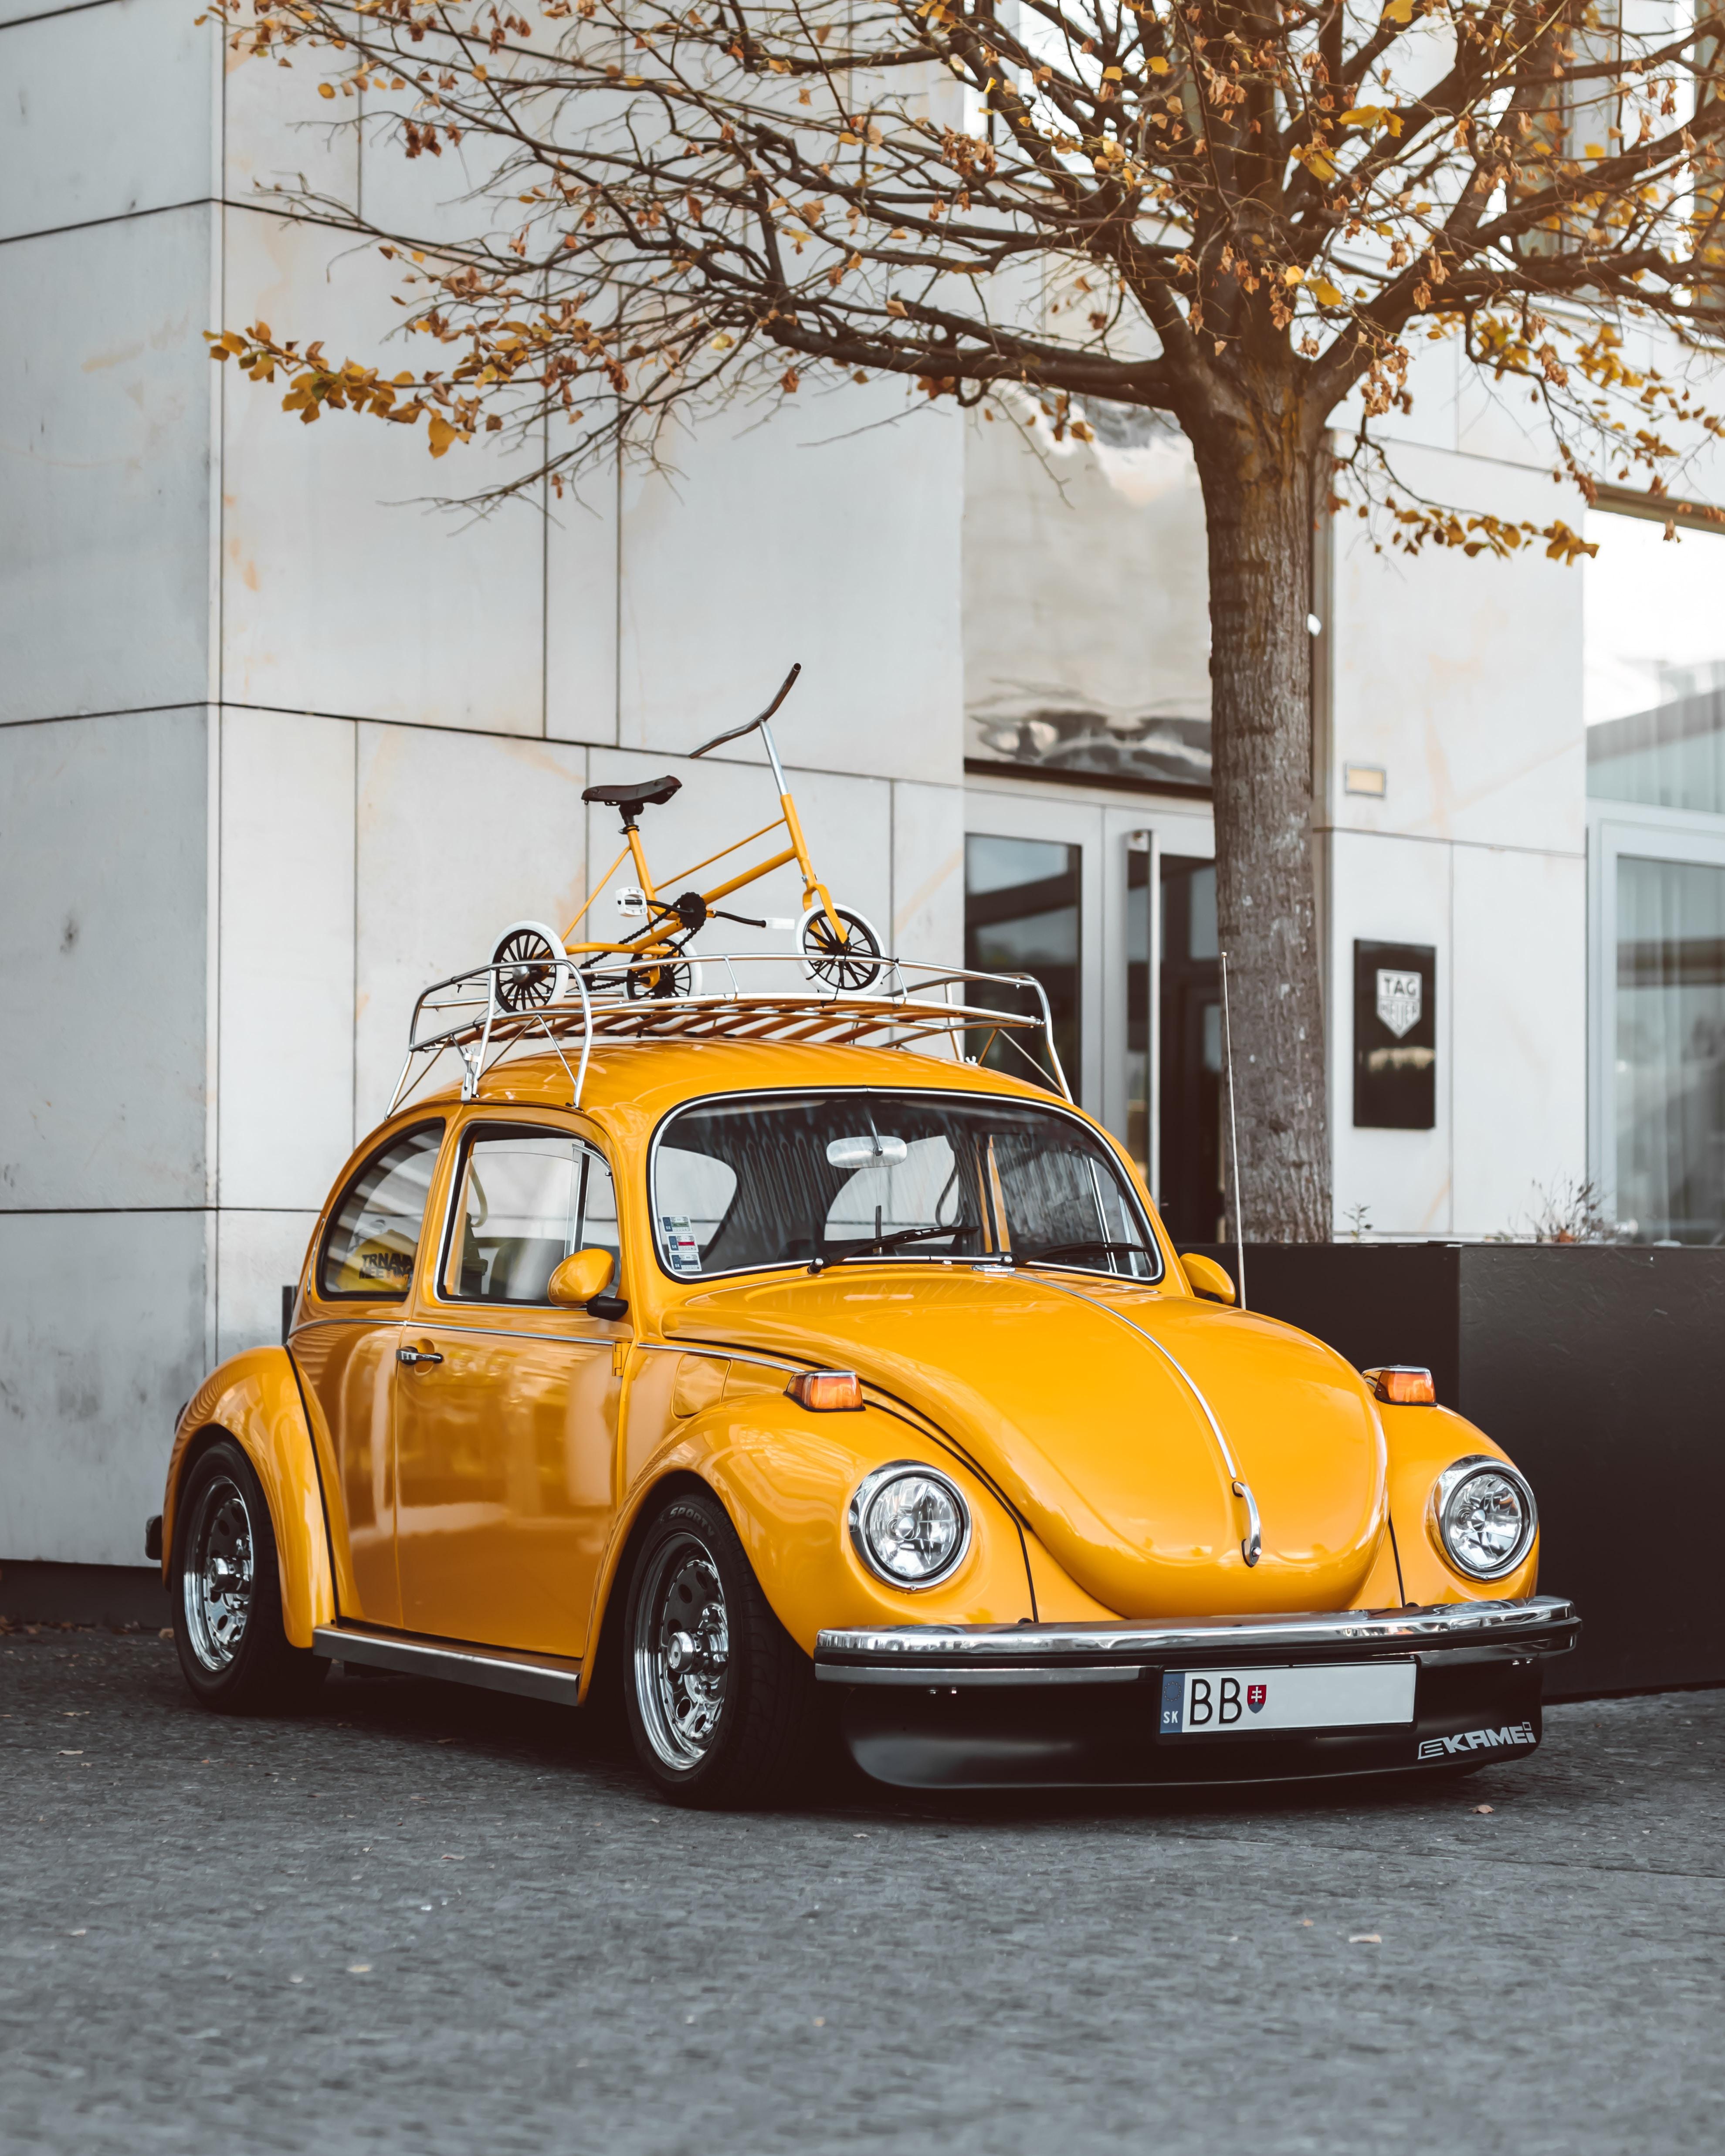 119702 download wallpaper Volkswagen, Cars, Car, Retro, Volkswagen Beetle screensavers and pictures for free